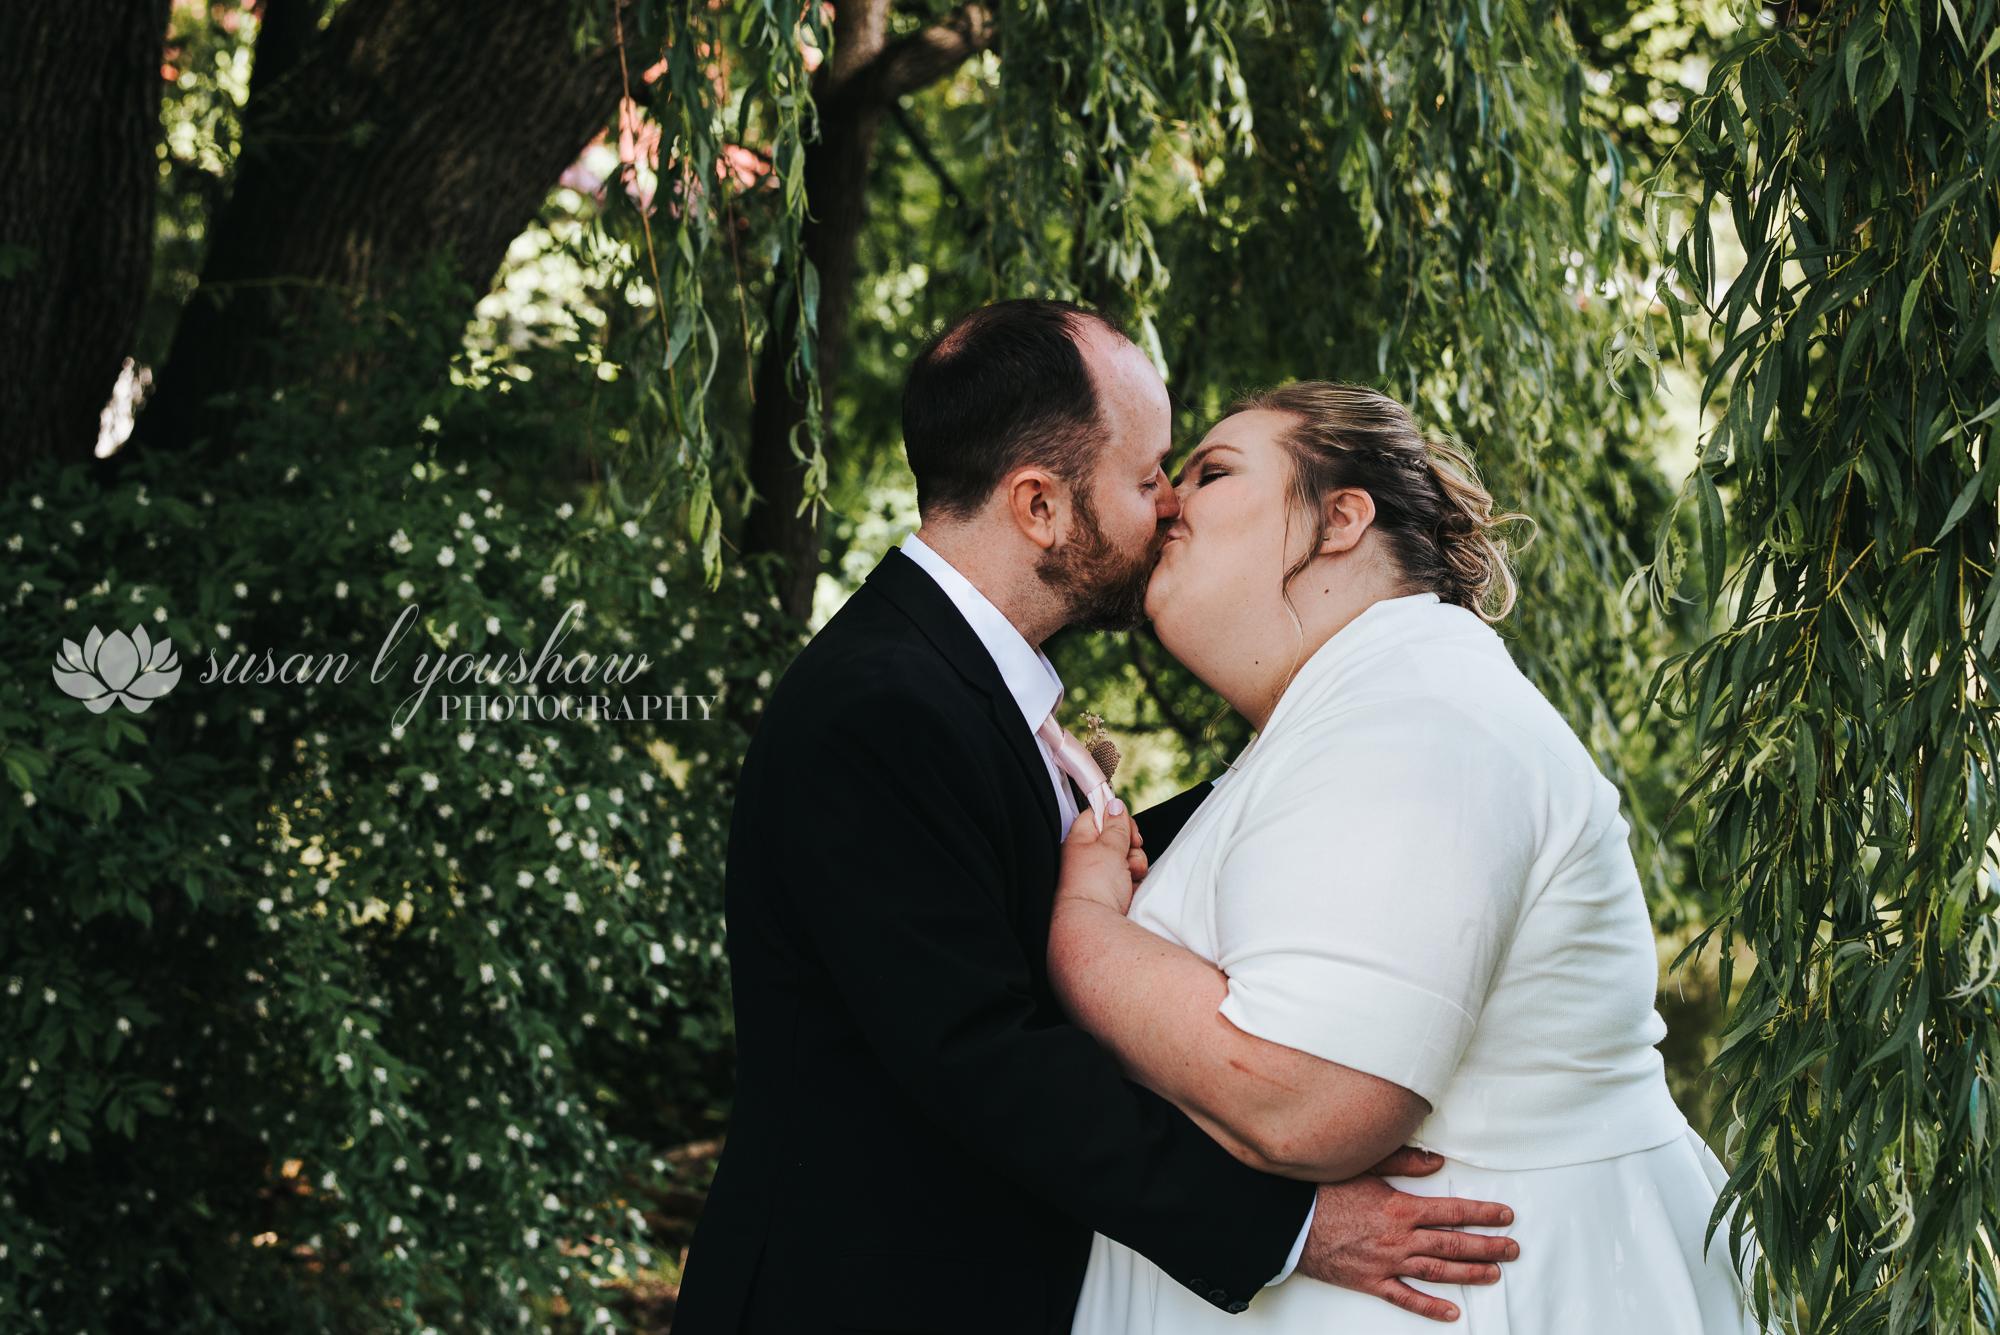 Bill and Sarah Wedding Photos 06-08-2019 SLY Photography -61.jpg